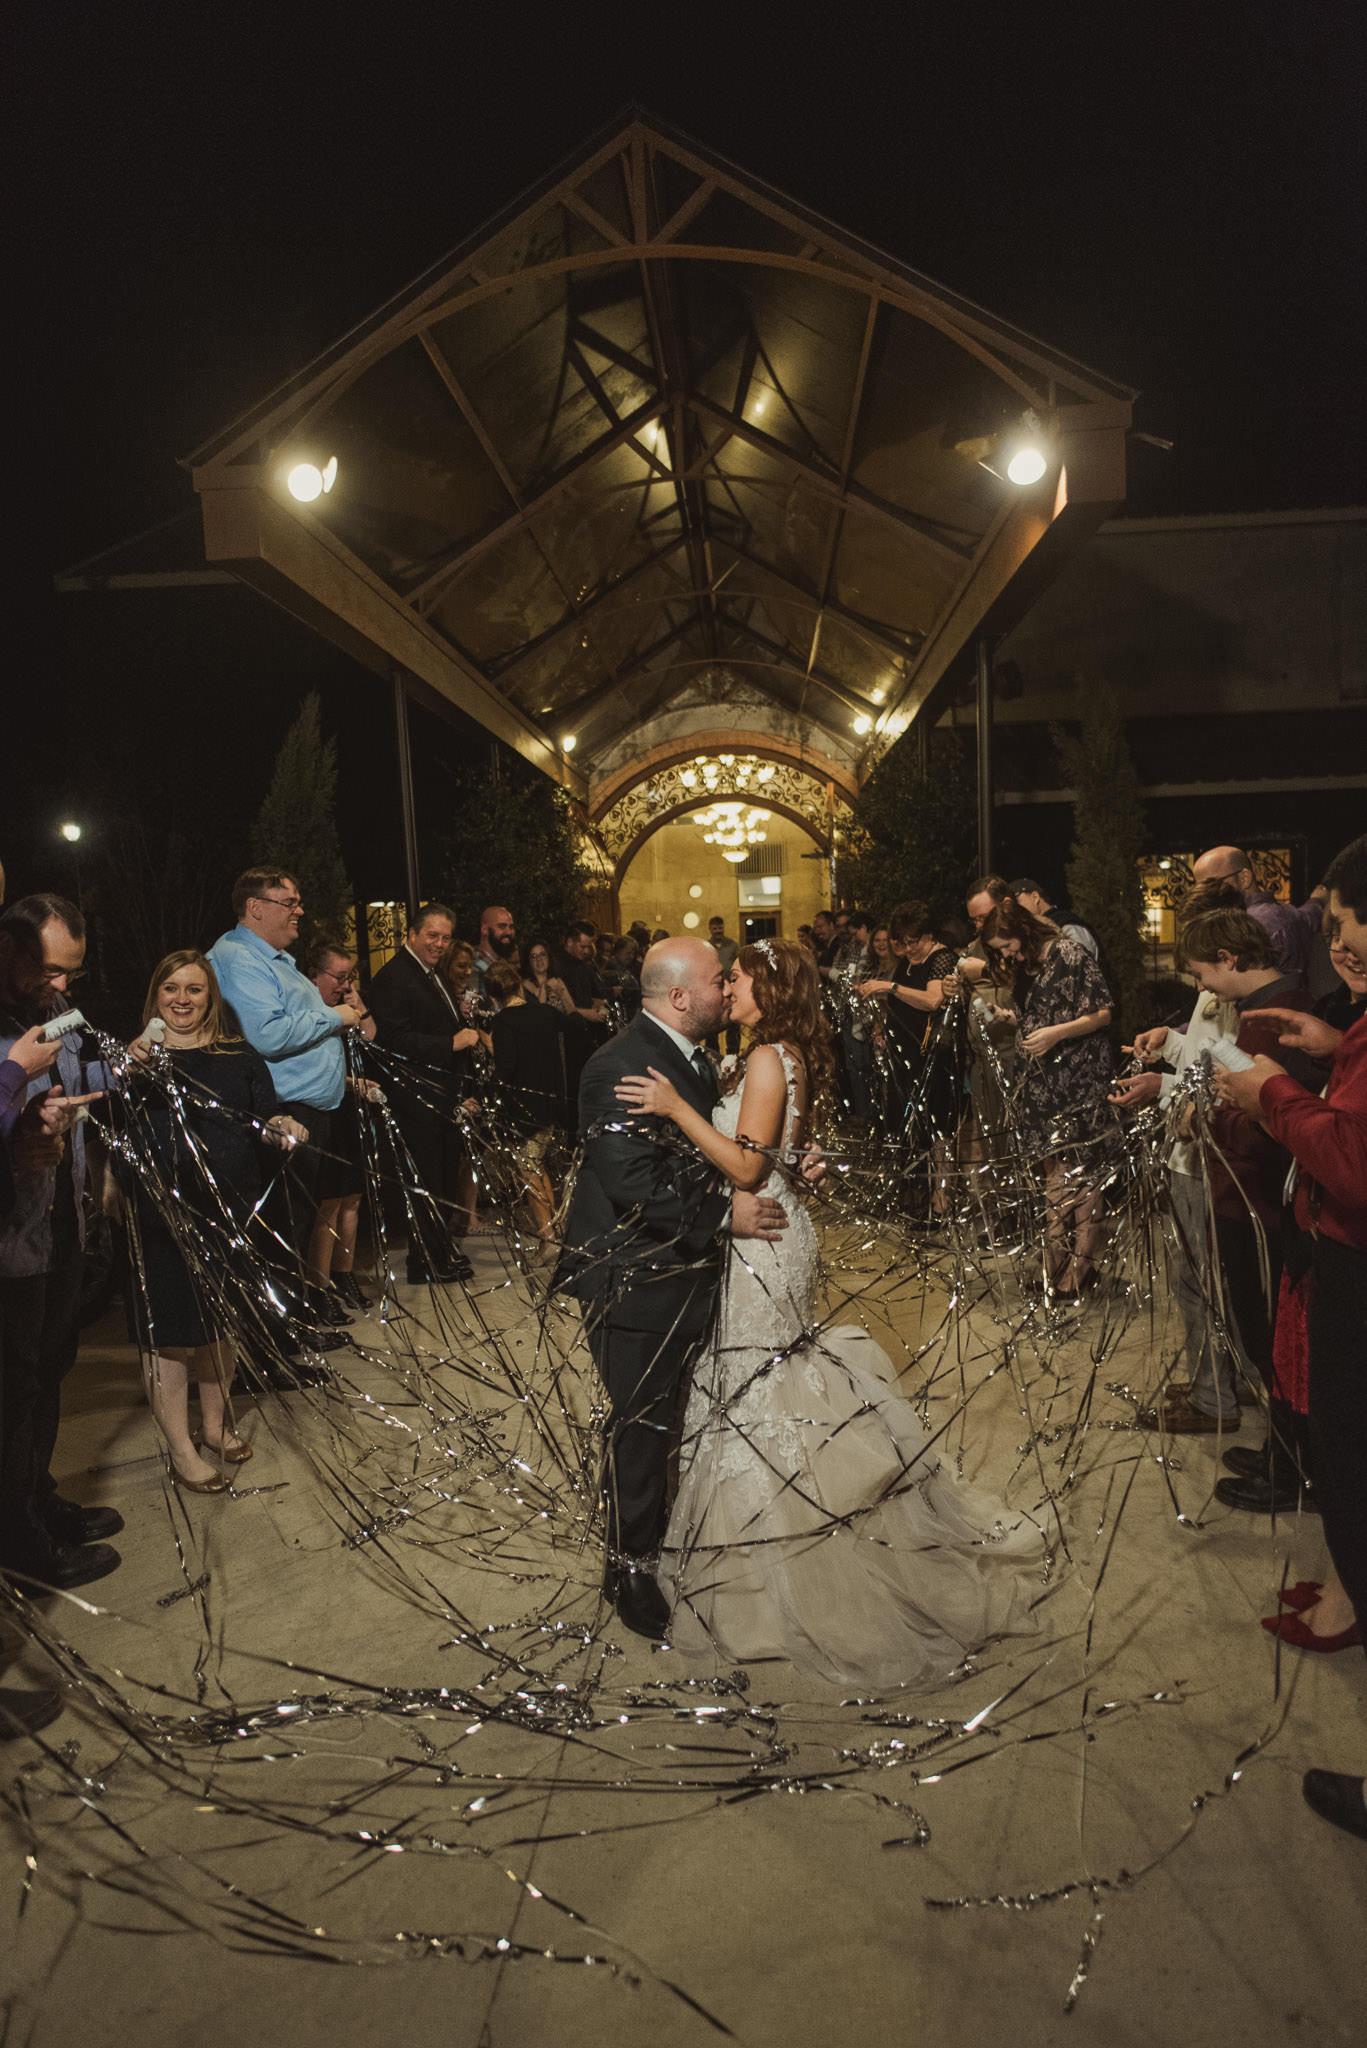 Cynthia-Curtis-Olde-Dobbine-Station-Houston-Wedding-Photographer-sm-94.jpg